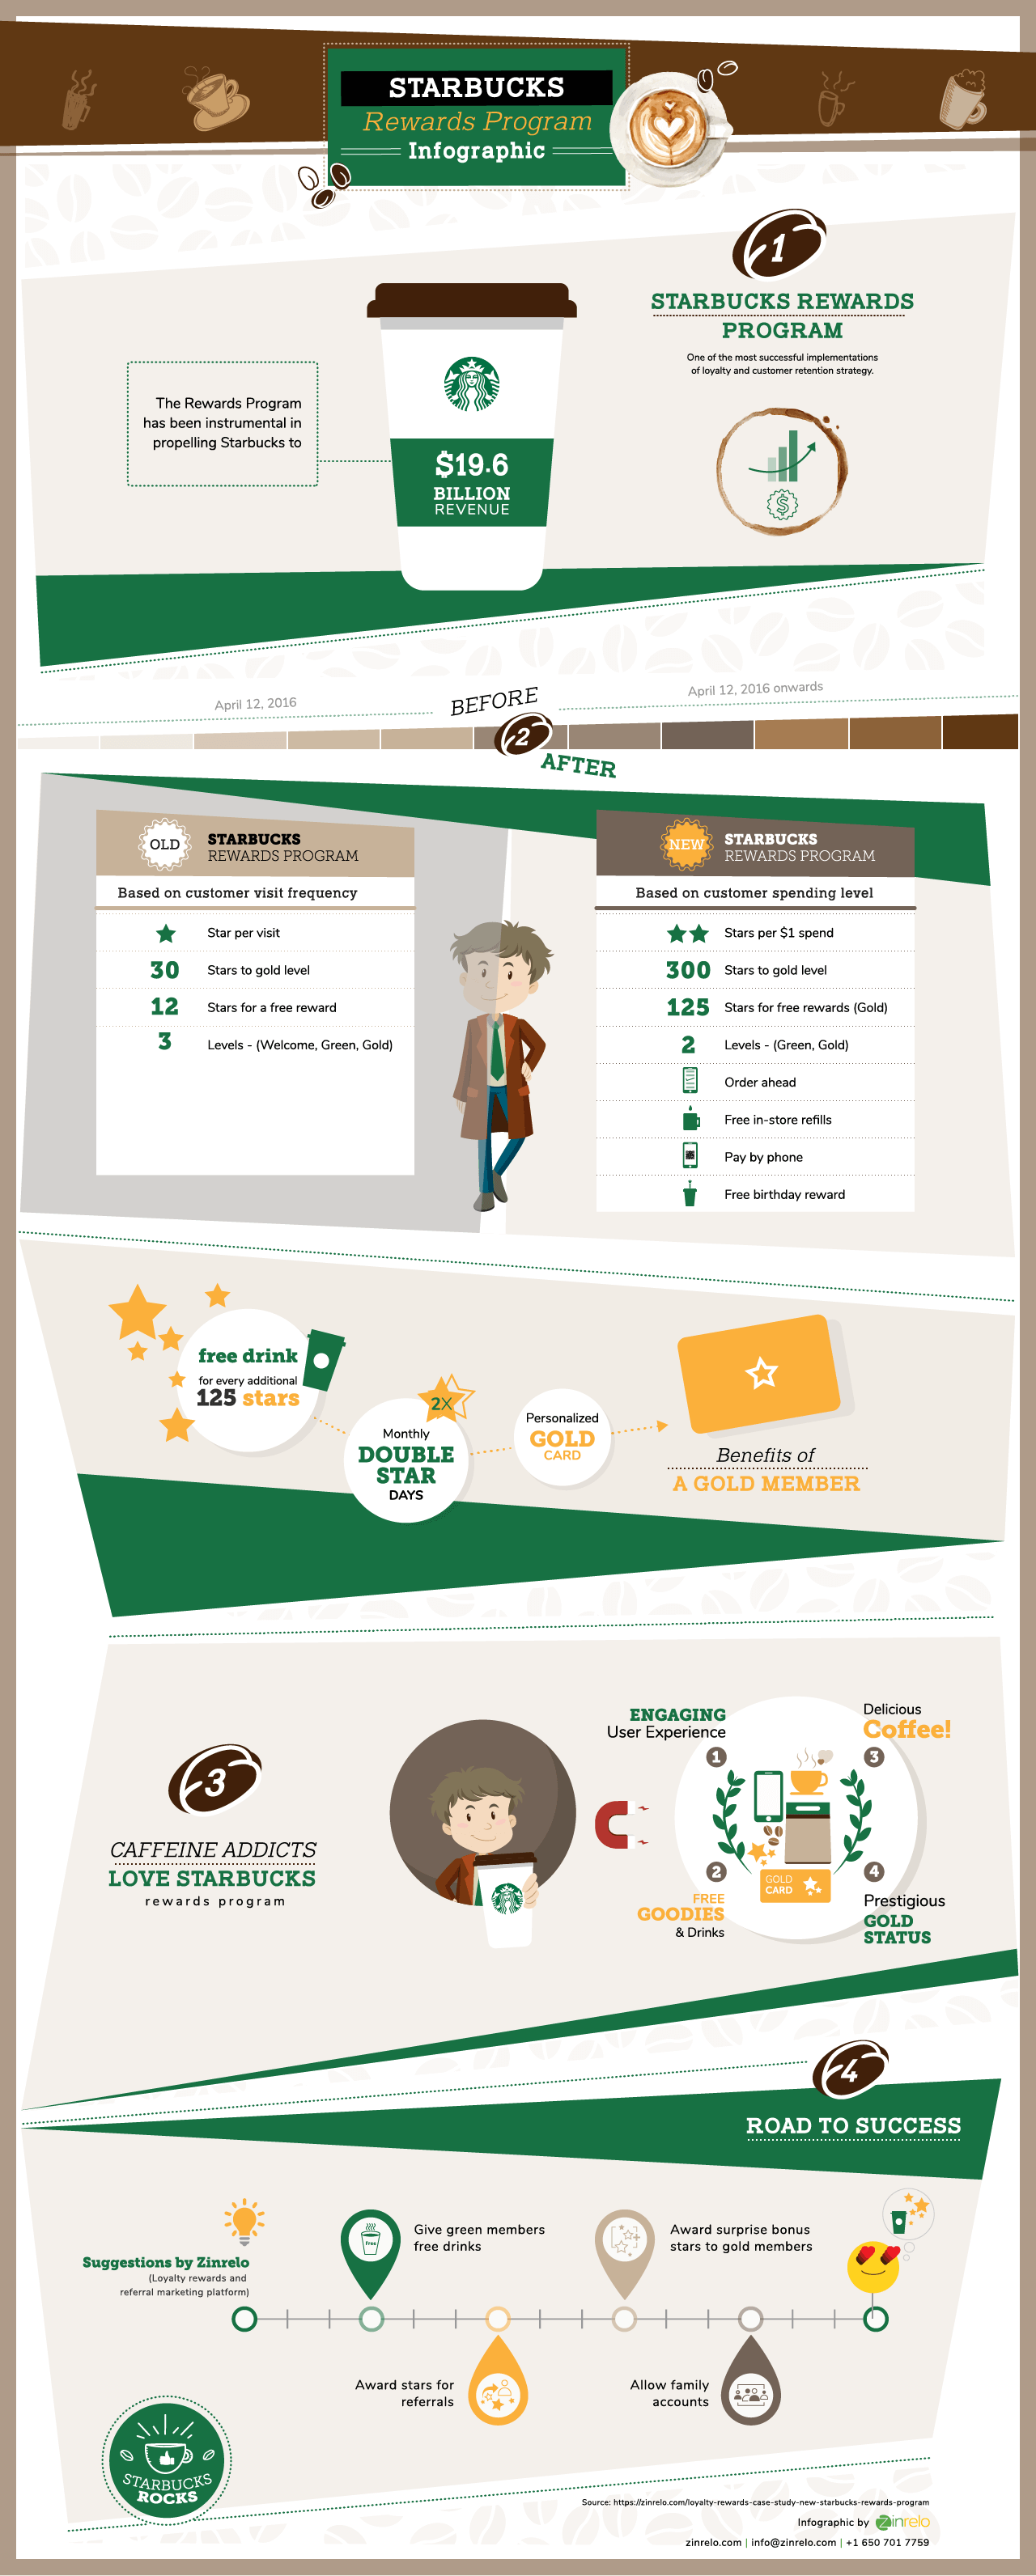 Starbucks Loyalty Rewards ProgramInfographic Loyalty